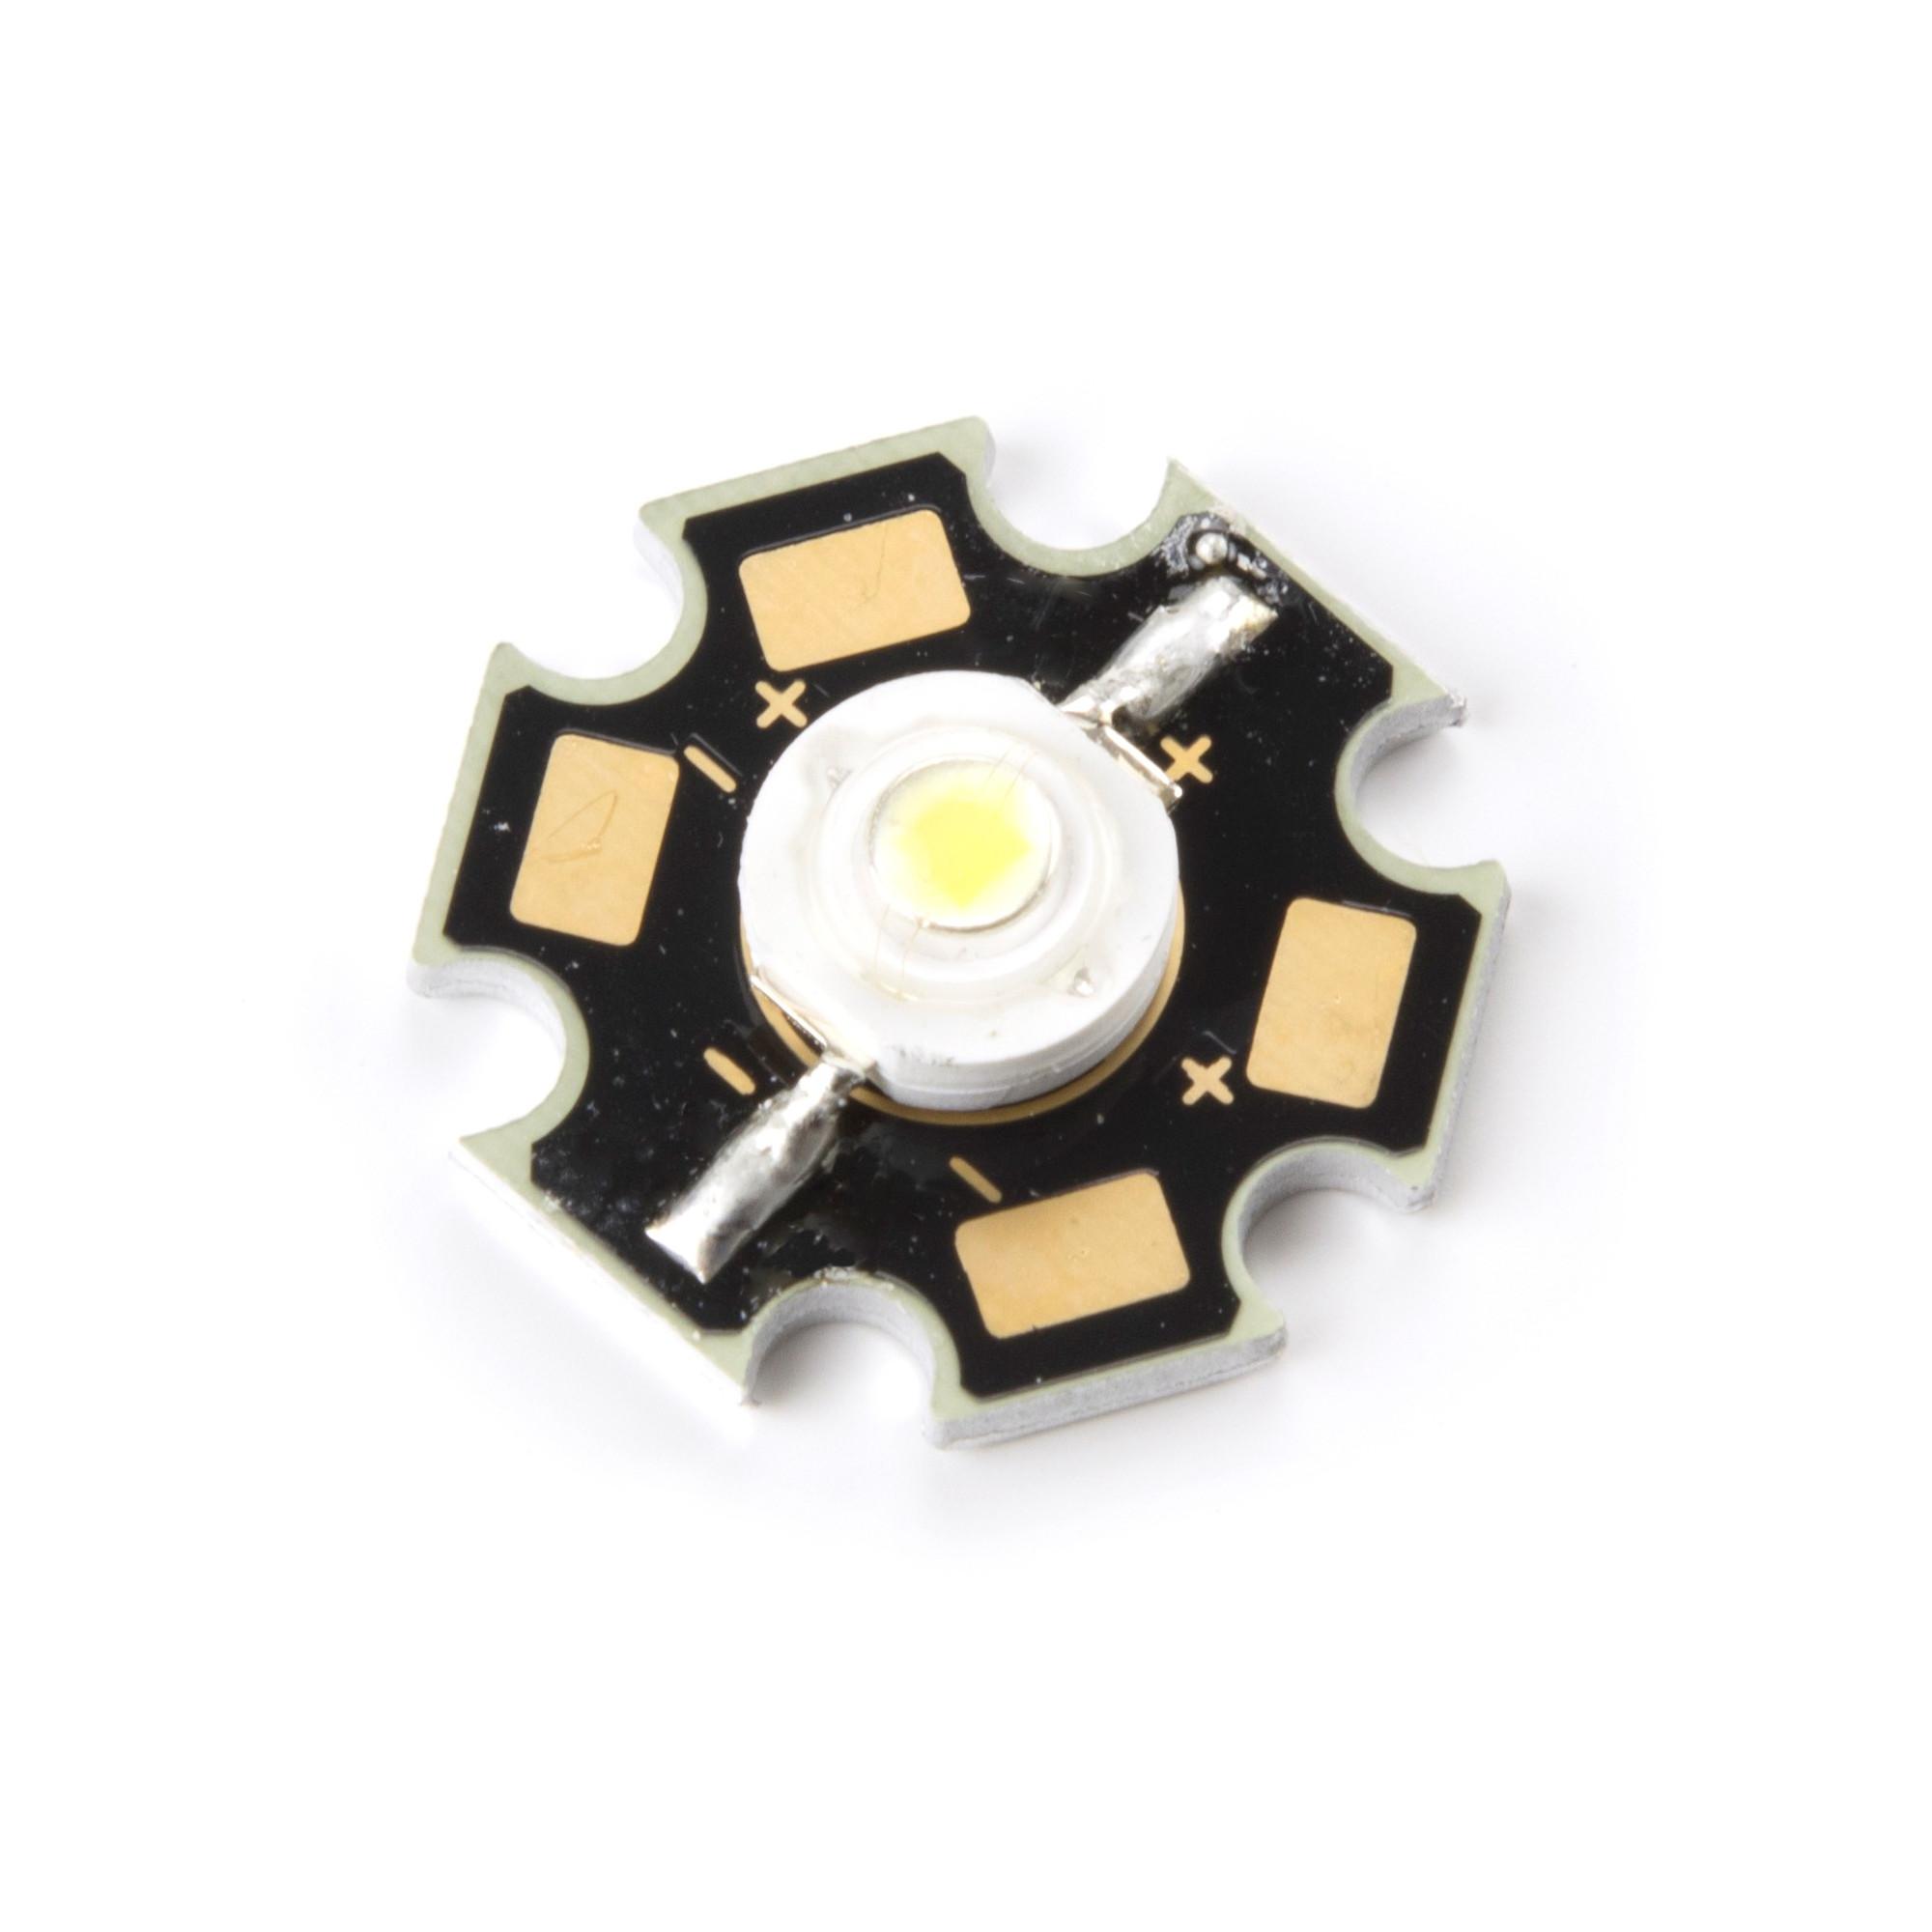 LED LUPA RECAMBIO (INCIDENTE)